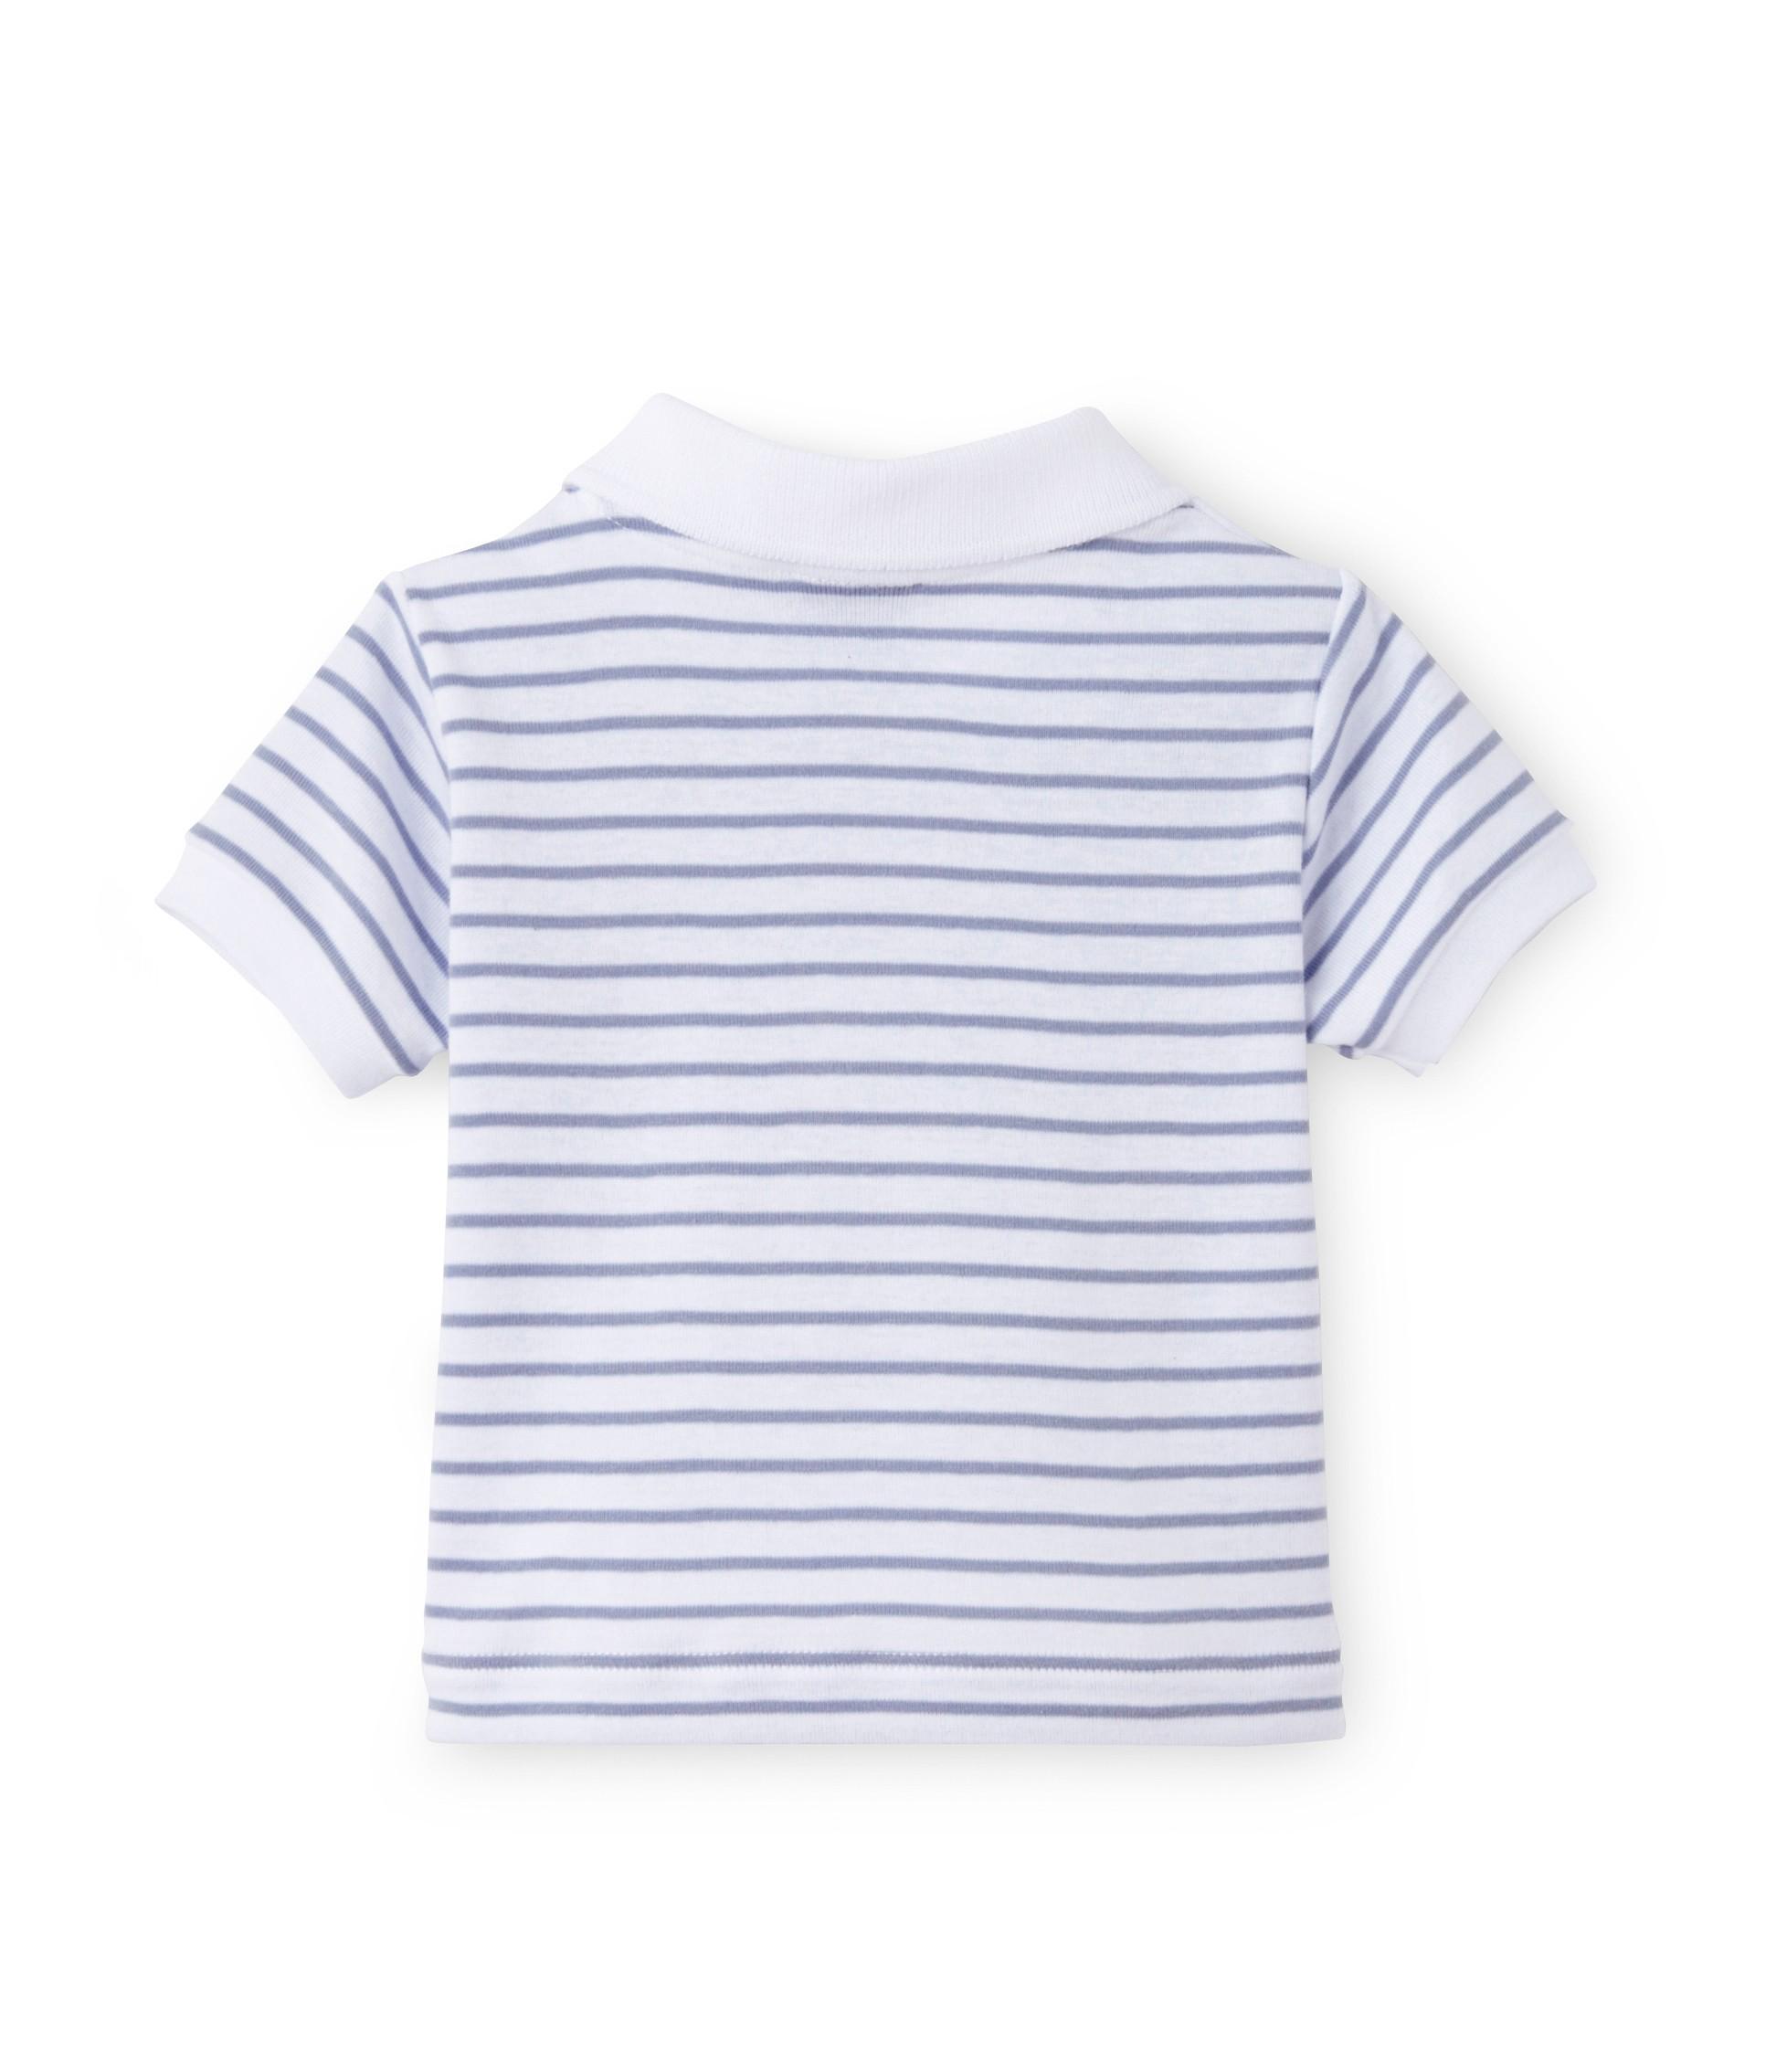 5d6e714e856a Μπλούζα πόλο ριγέ για μωρό αγόρι - petit-bateau.gr